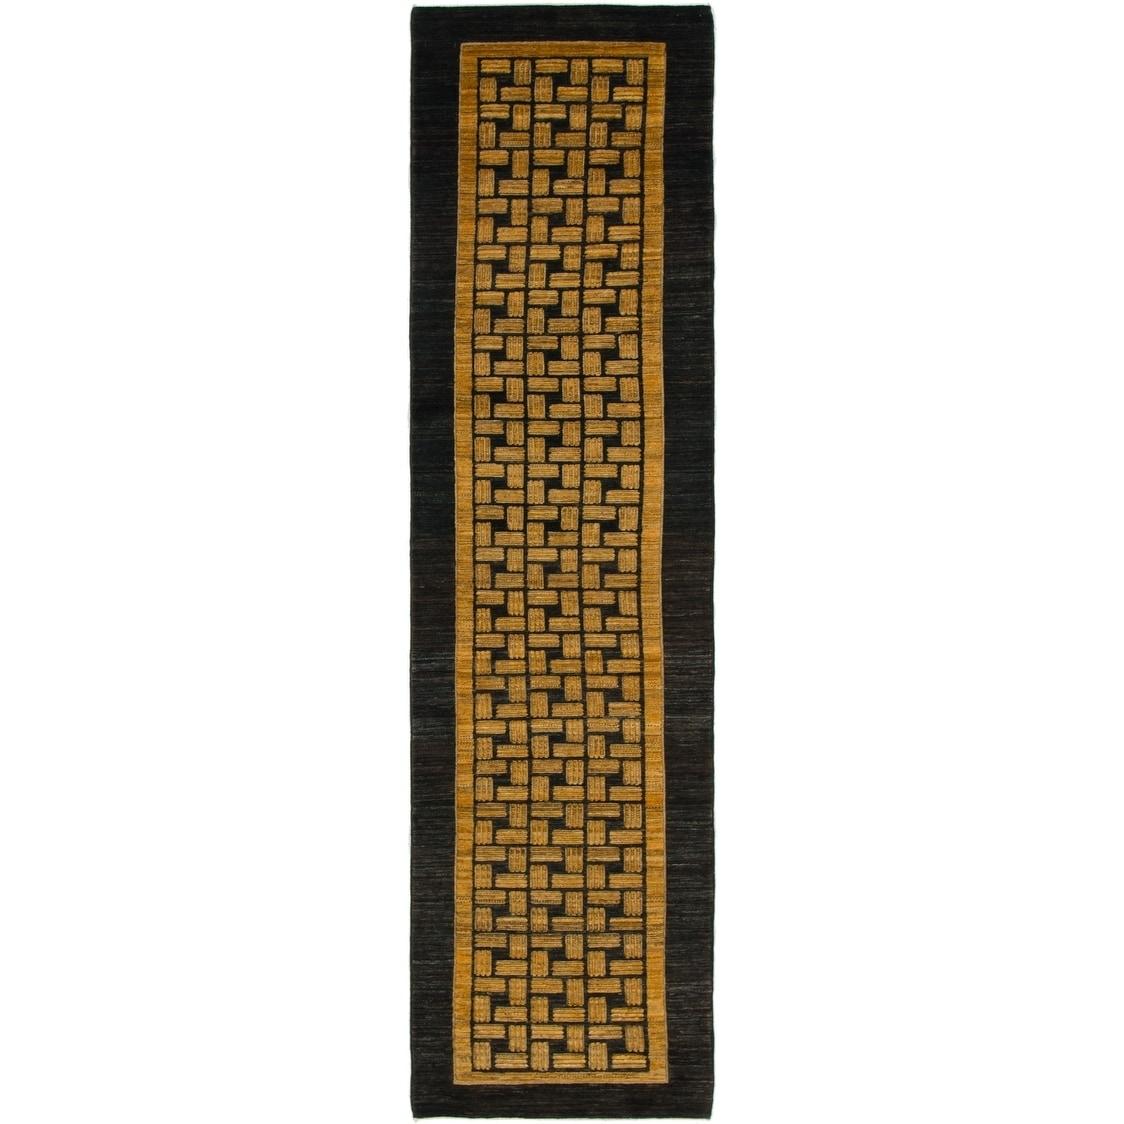 Hand Knotted Kashkuli Gabbeh Wool Runner Rug - 2 7 x 10 2 (Gold - 2 7 x 10 2)